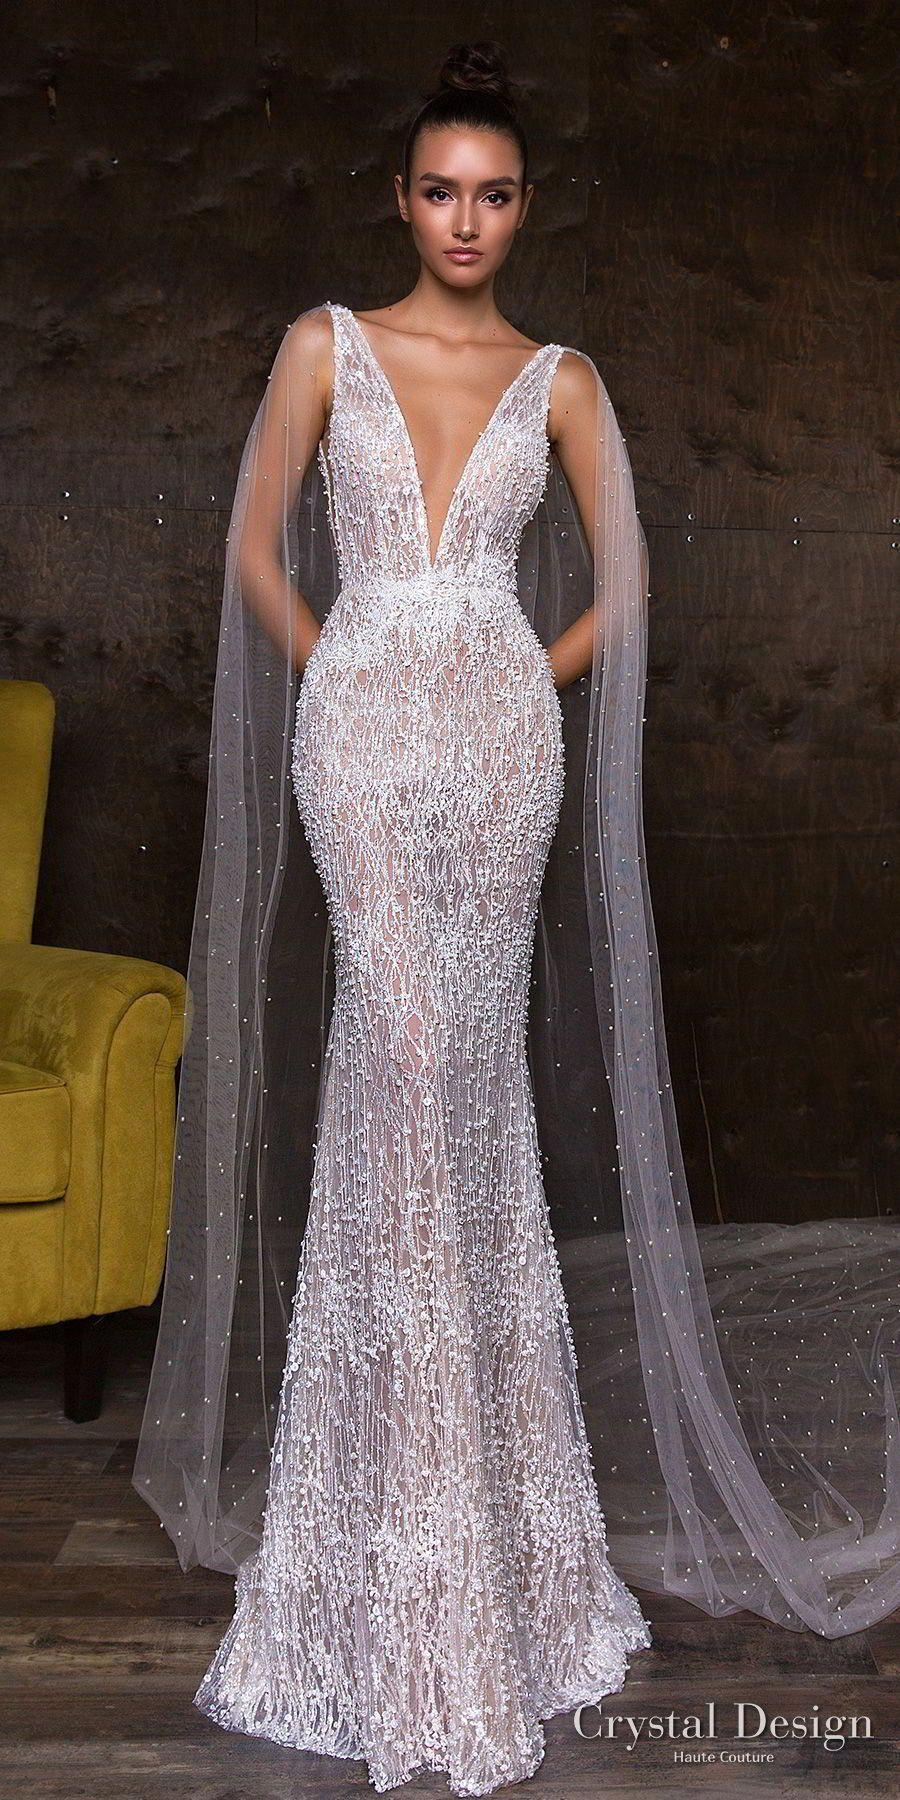 Simple elegant wedding dress designers  crystal design  sleeveless deep v neck full embellishment